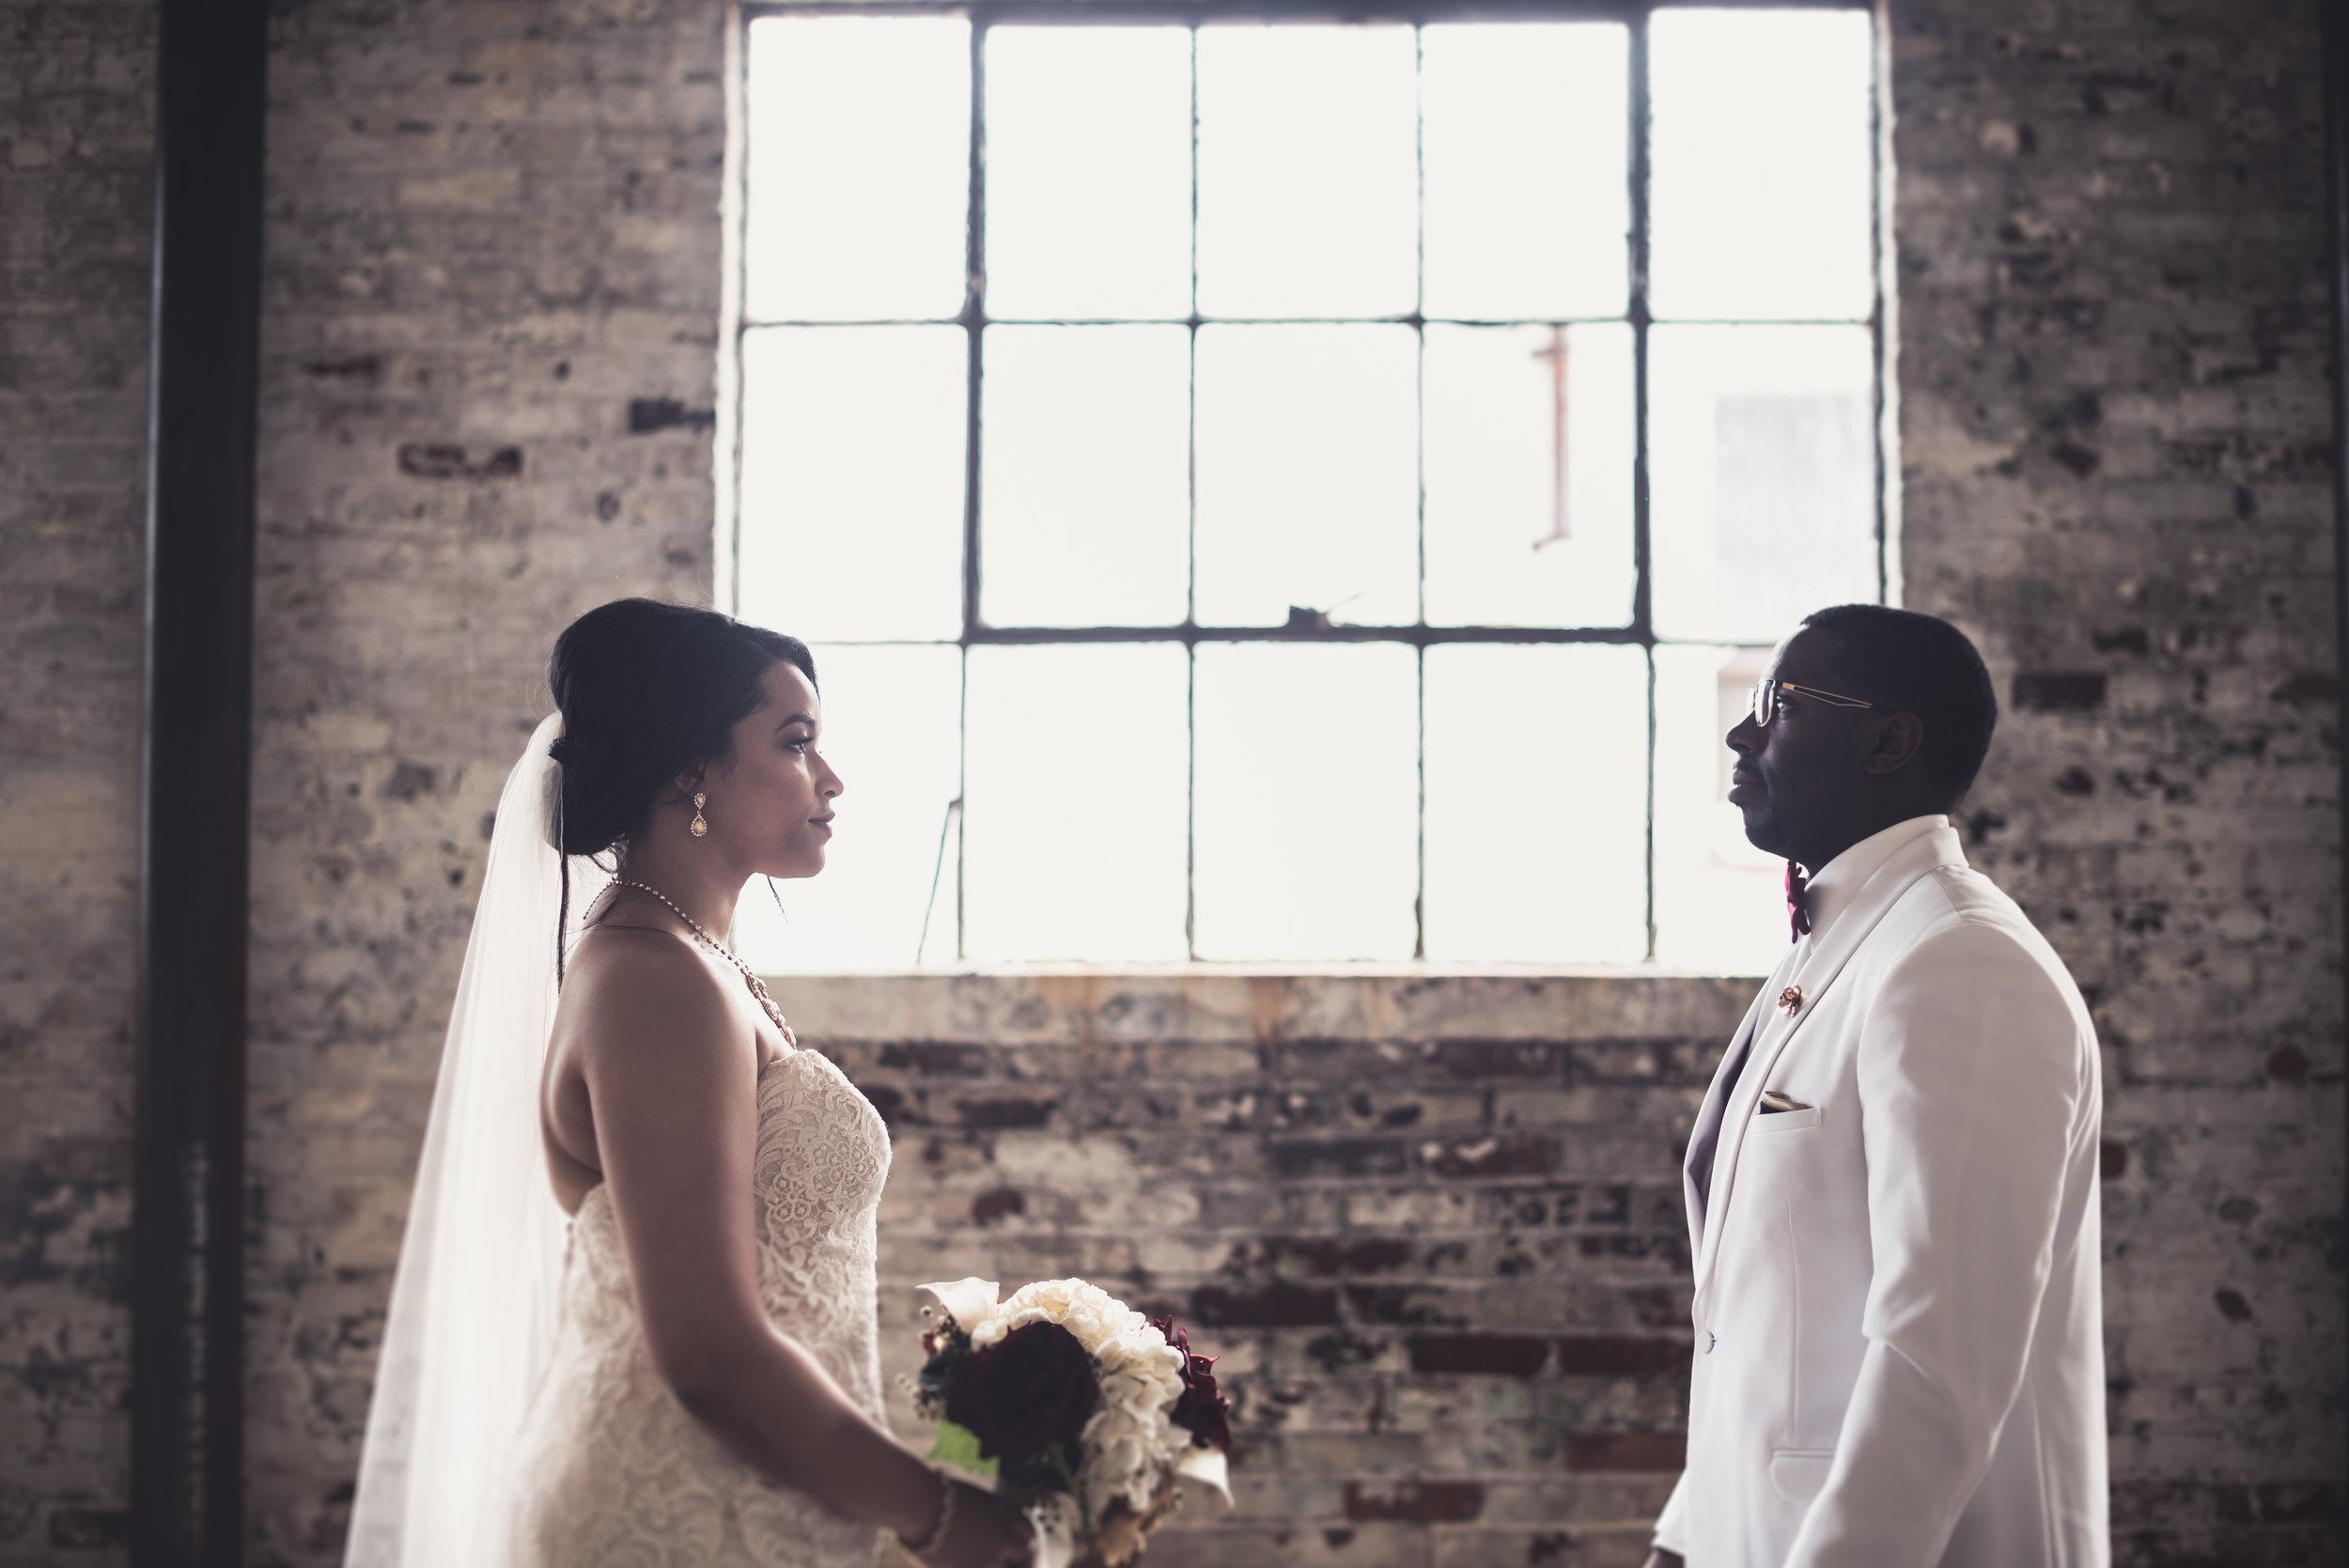 Burlington Iowa Wedding Midwest Photographer Melissa Cervantes _ Chantelle and Isaiah 320l.jpg